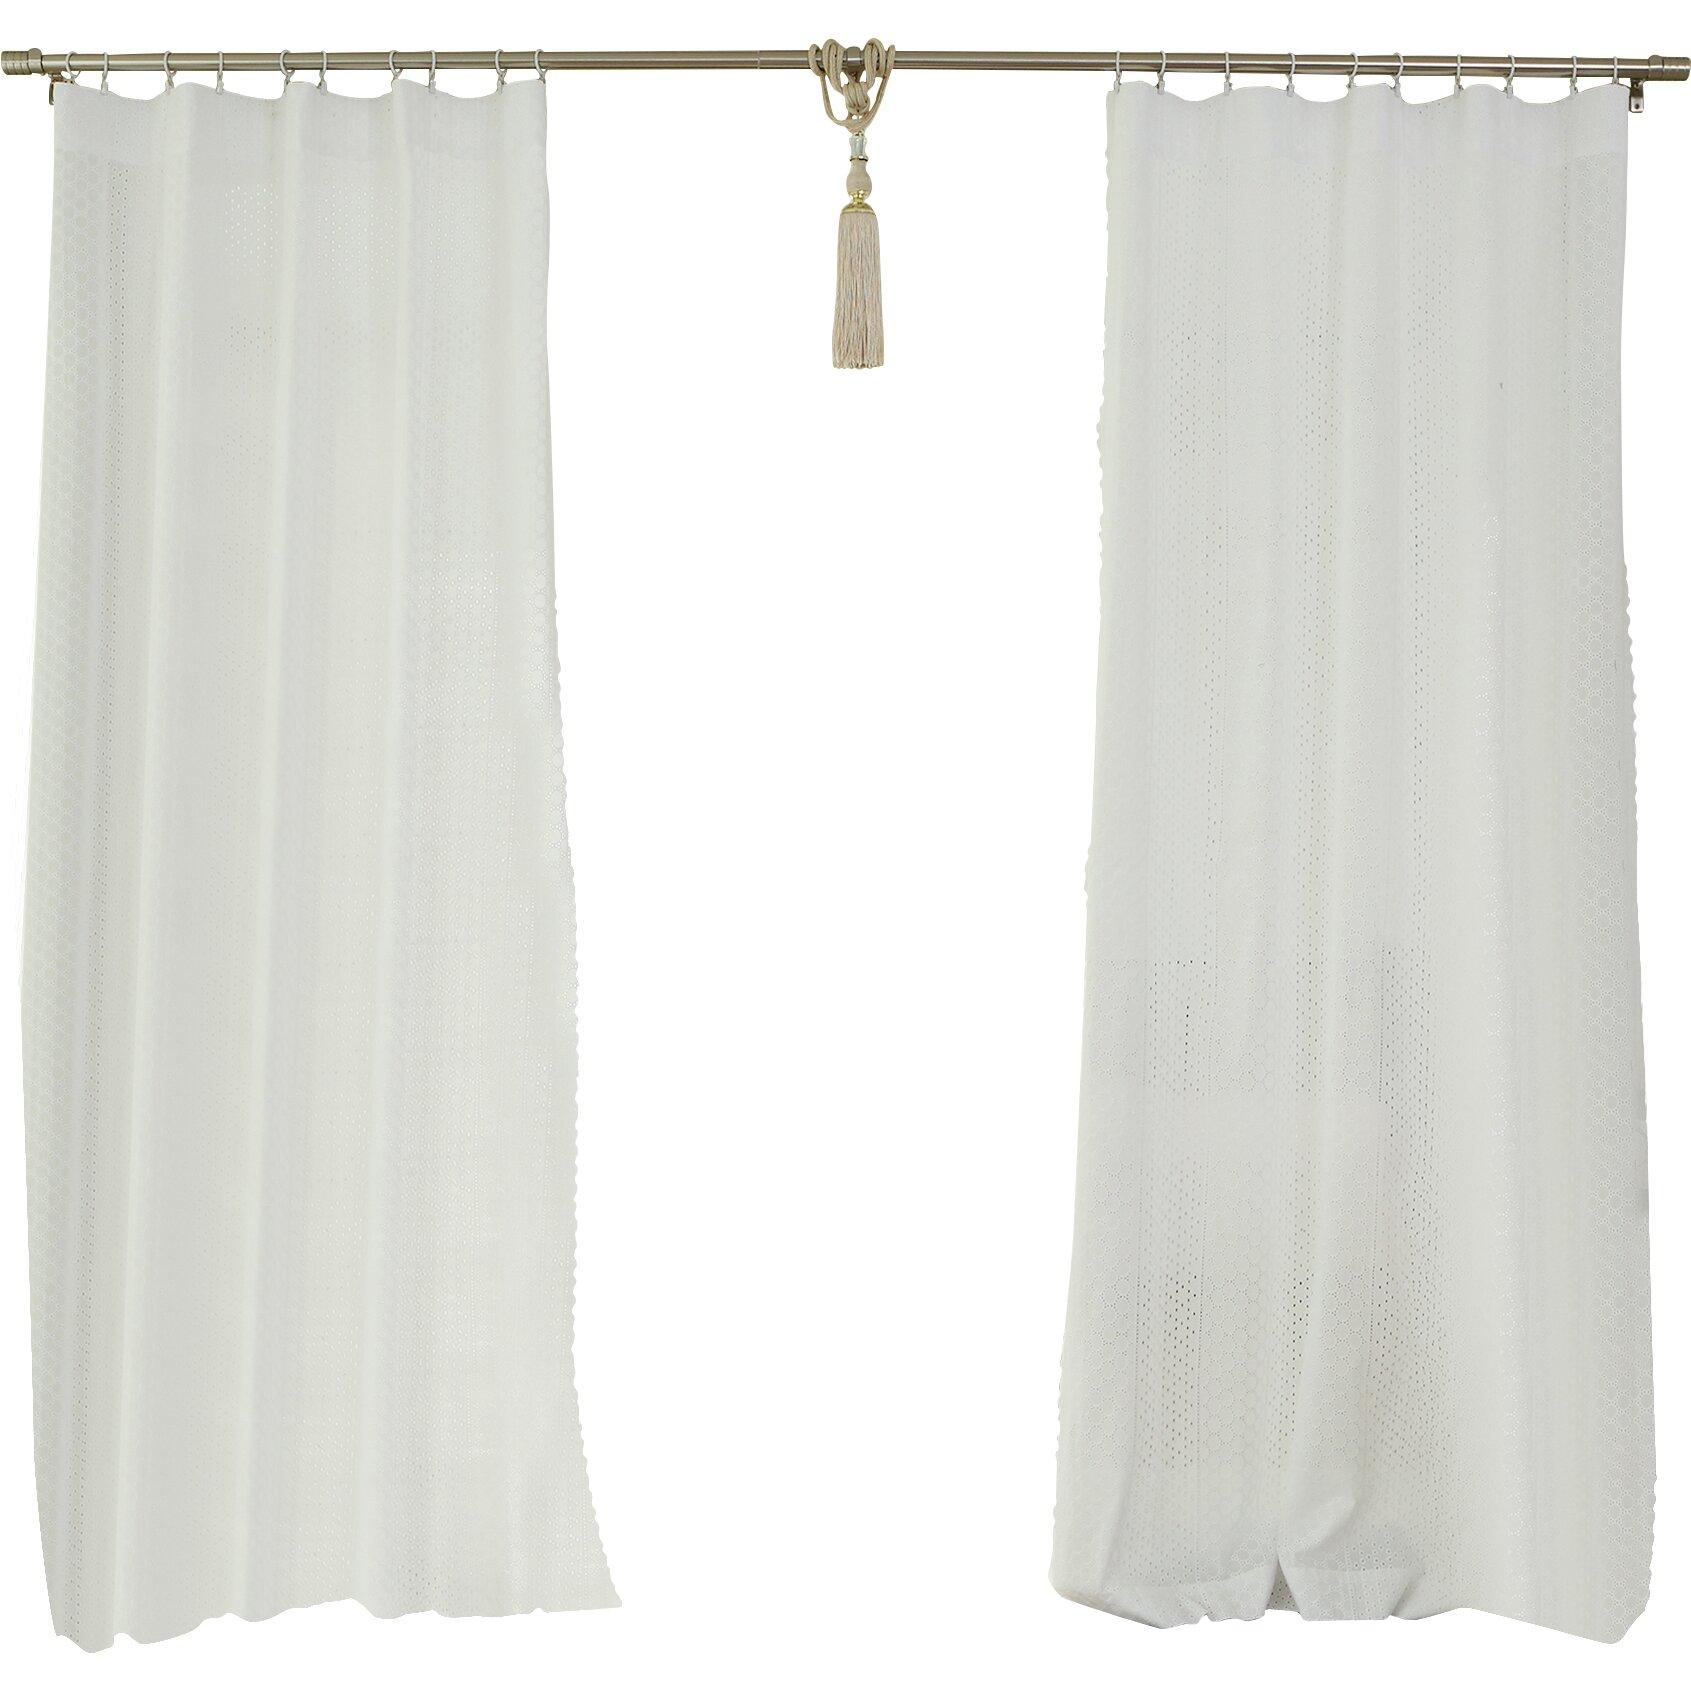 Geometric Semi Sheer Tab Top Curtain Panels Reviews Birch Lane